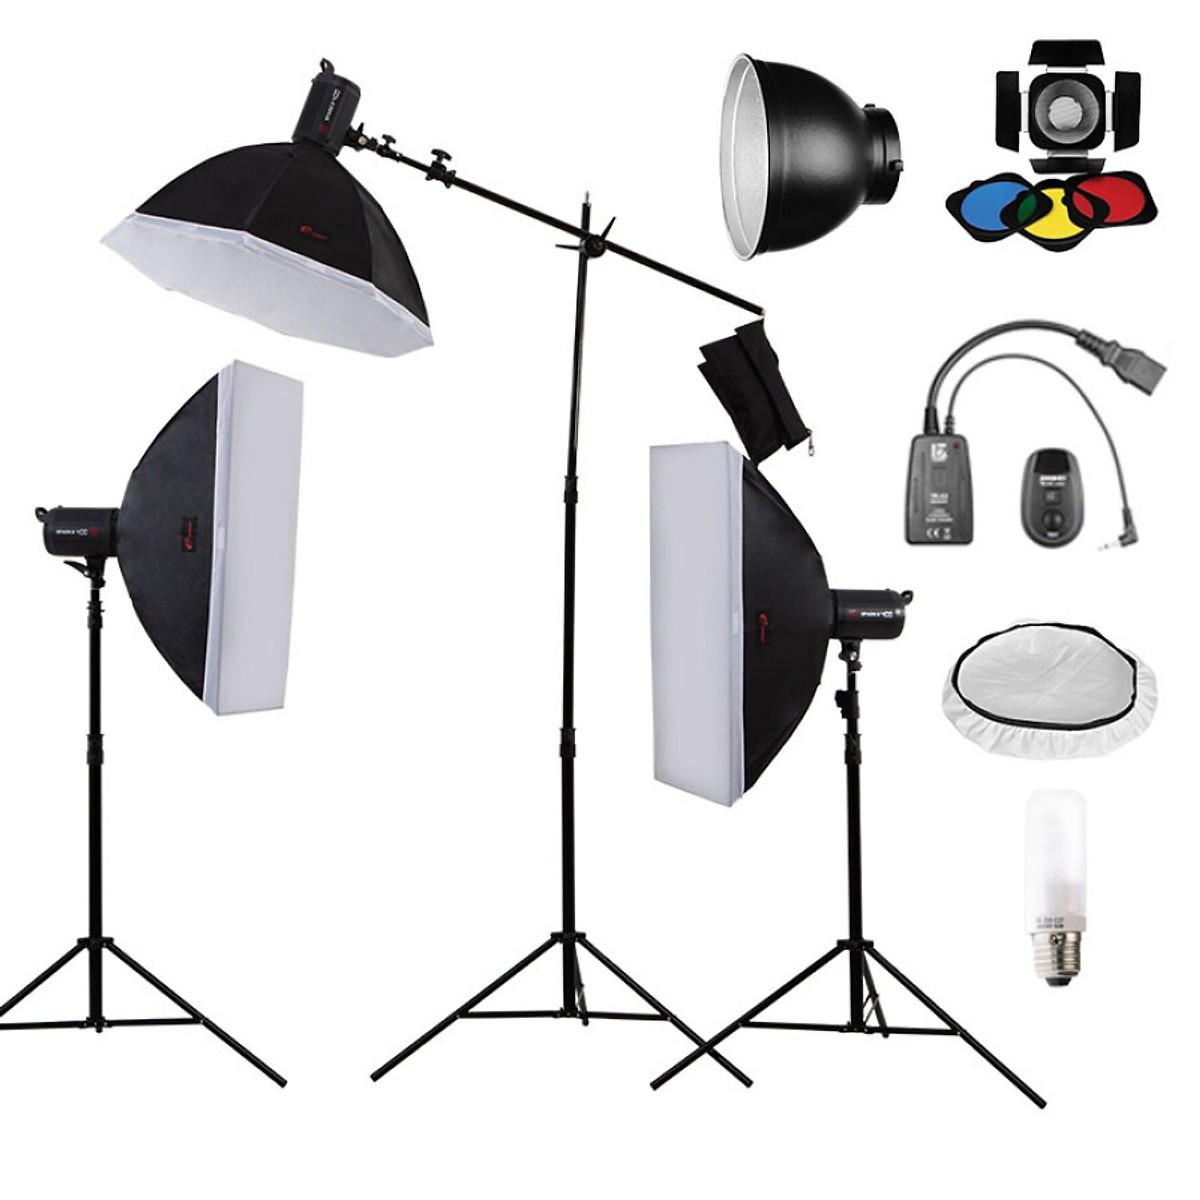 Bộ Đèn Chụp Ảnh Studio Kim Pui SPARKII400W (3 Cái)